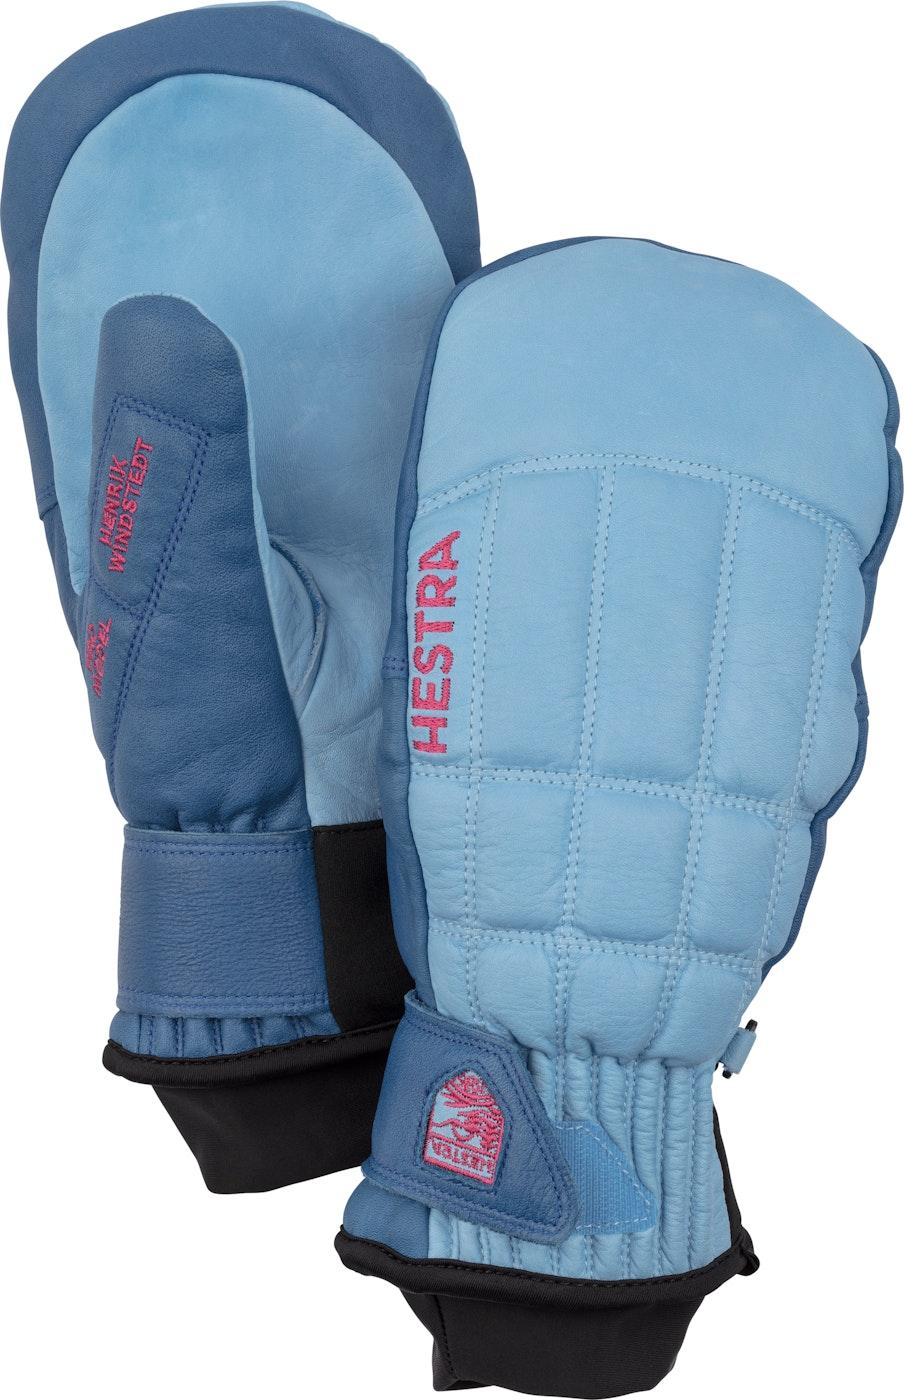 Product image for 30821 Henrik Leather Pro Model